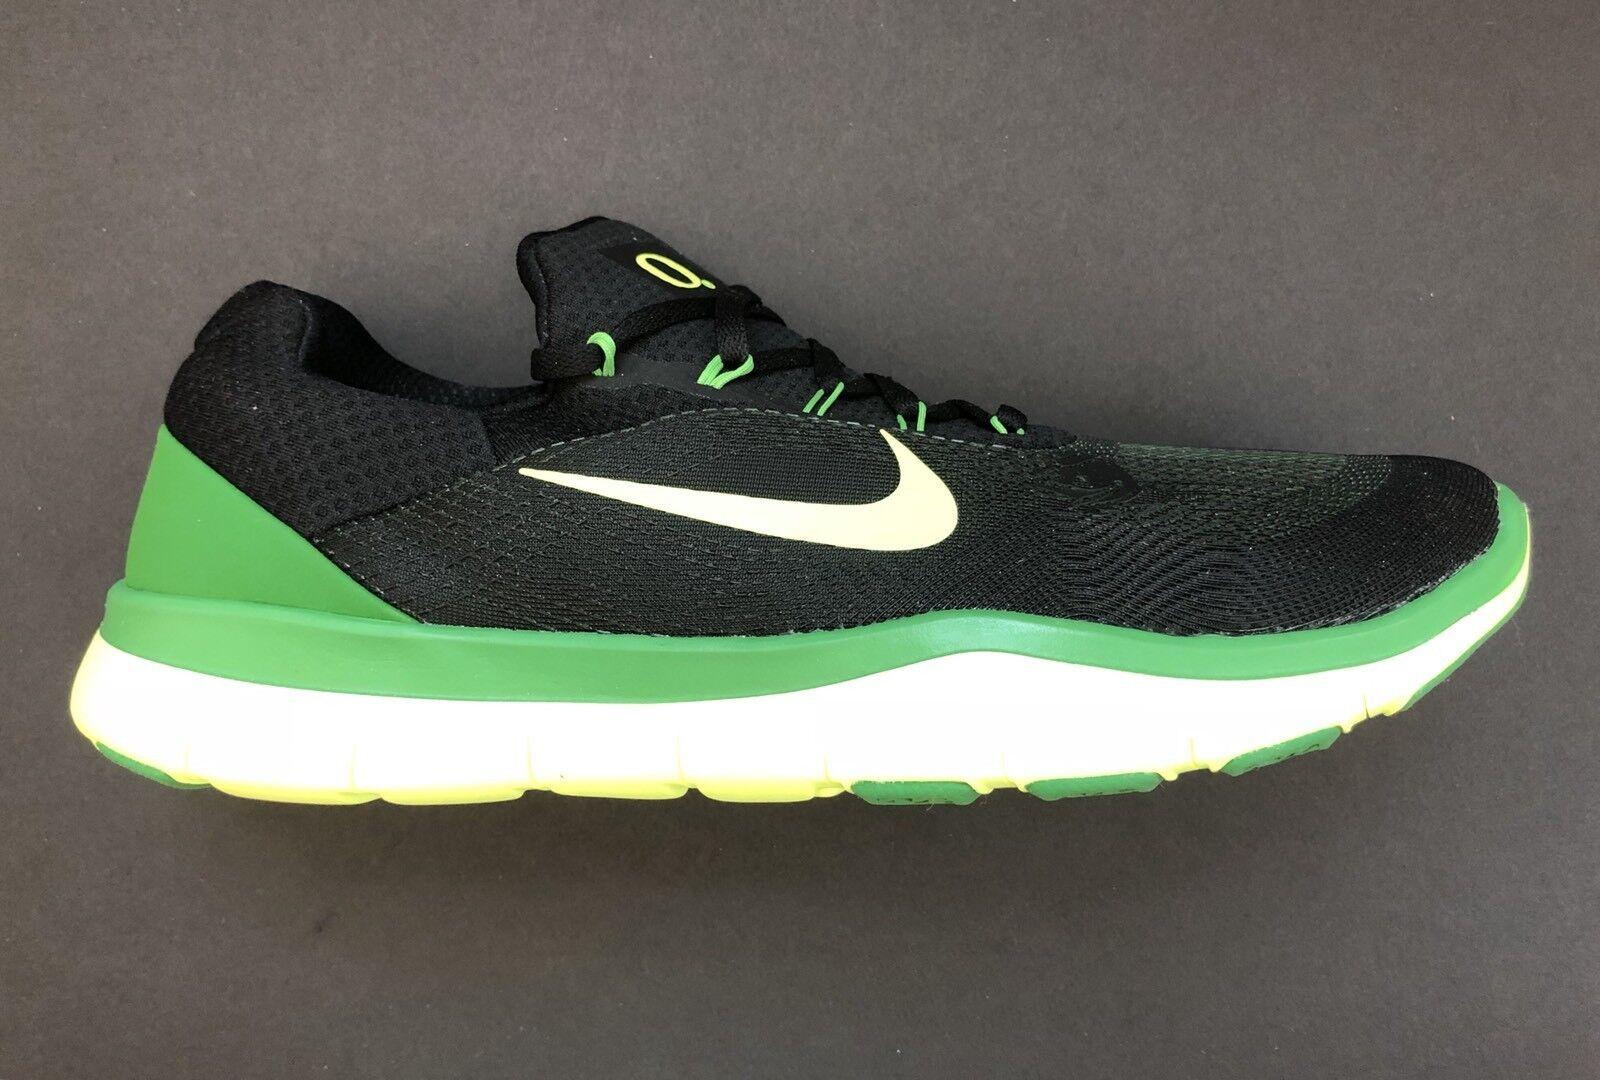 Nike Oregon Ducks Free Trainer V7 SG College shoes 898049-301 Size Men's 12 M US